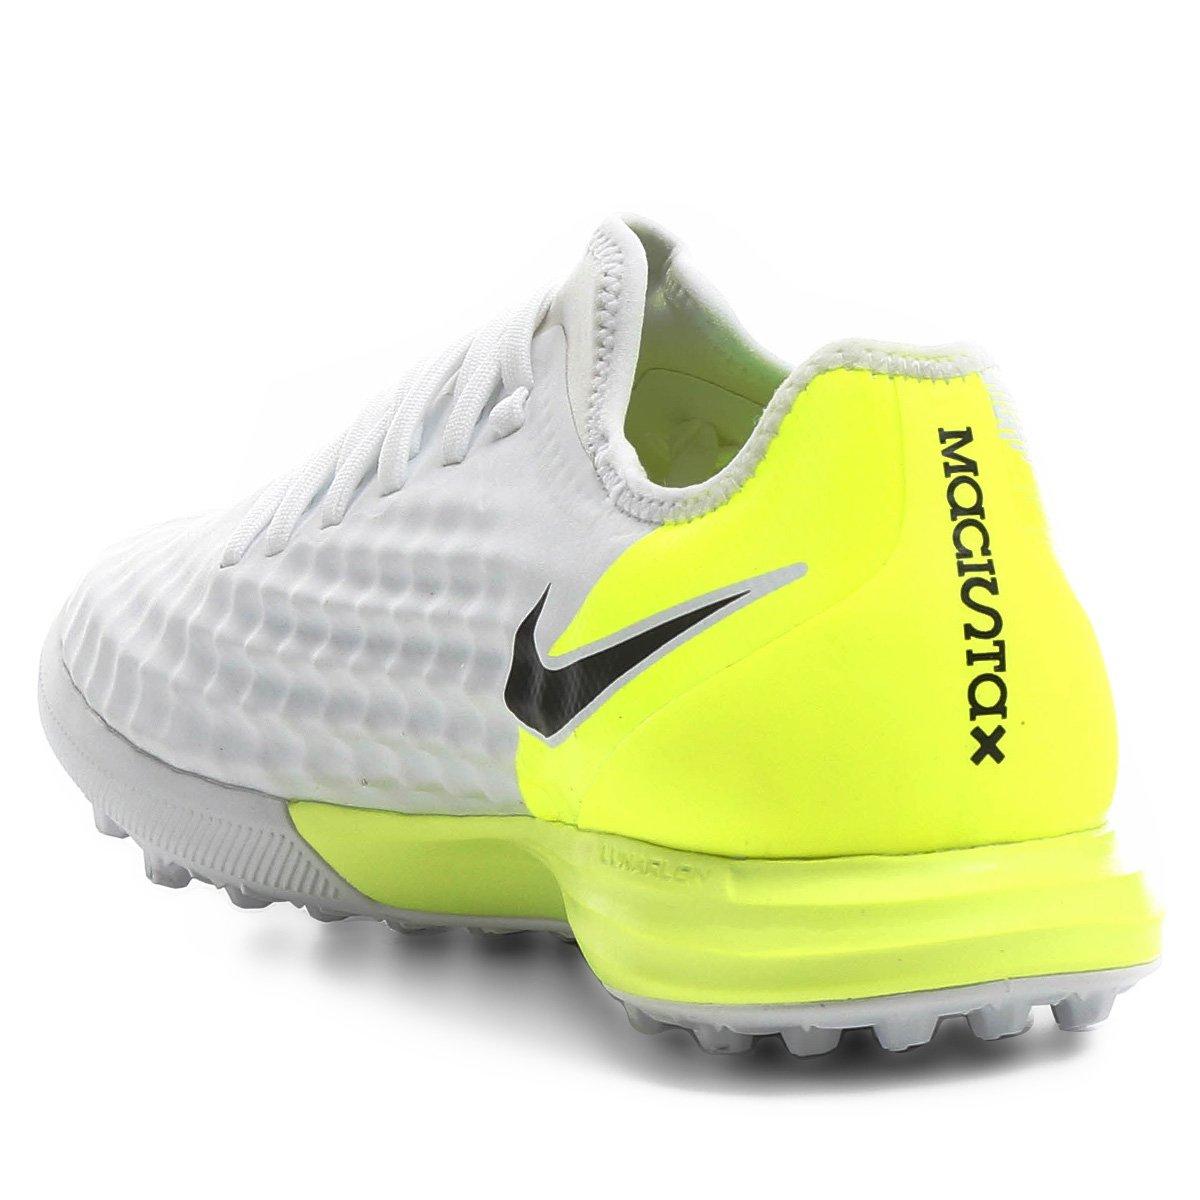 1b32d0e9e8 Chuteira Society Nike Magista Finale 2 TF